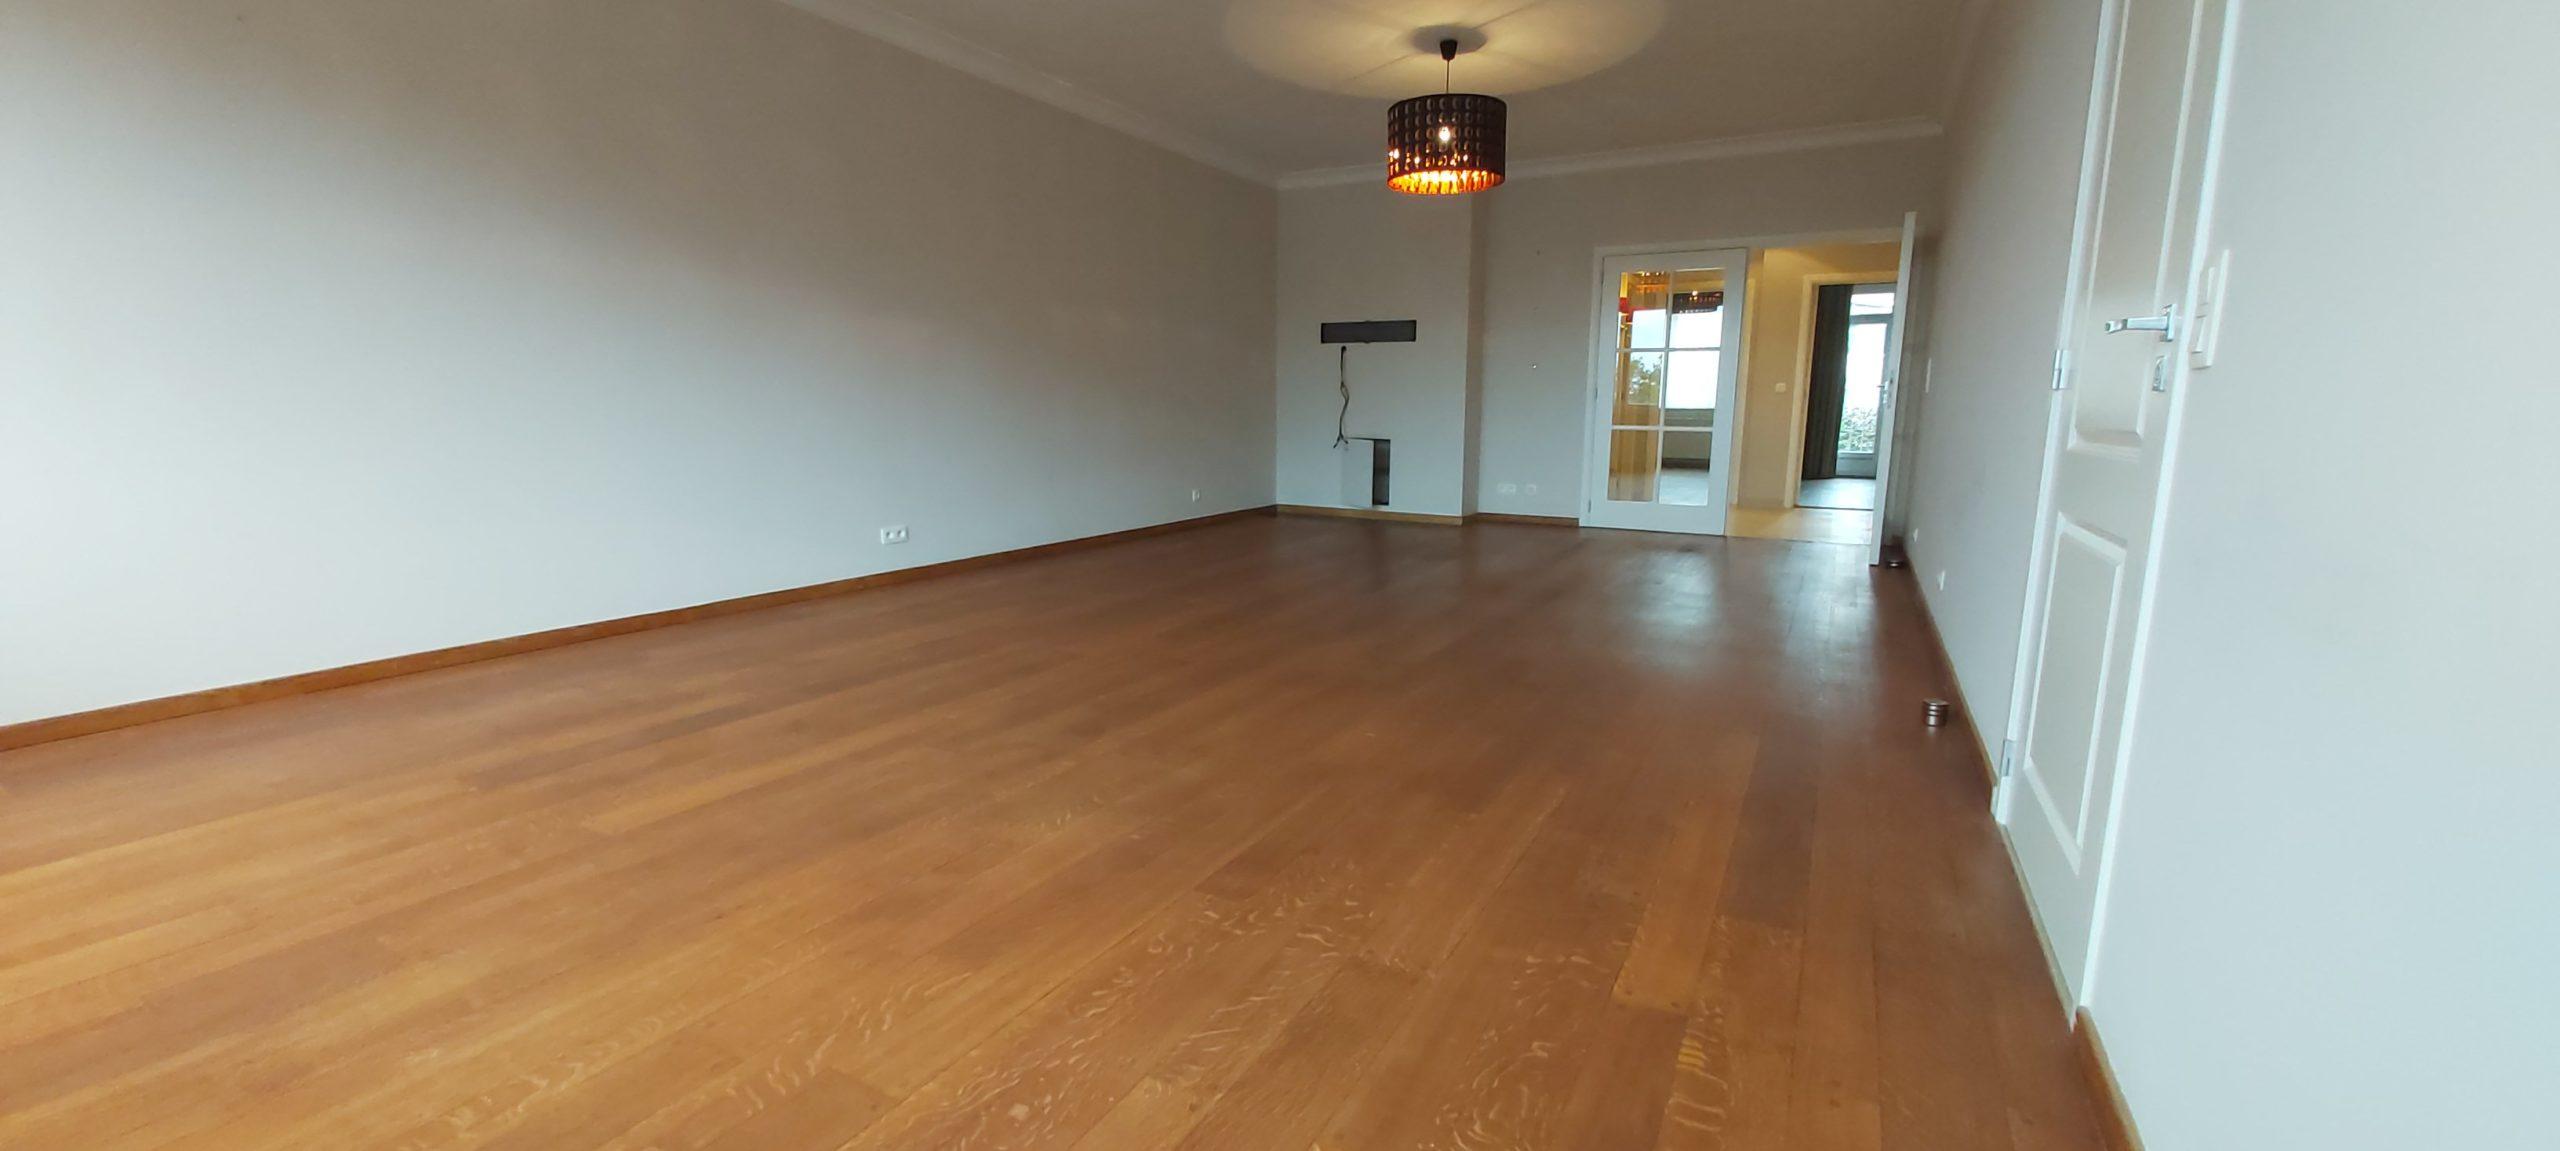 Superbe appartement 113 m² parquet 2 chs living cuisine hyper eqp terrasse poss garage